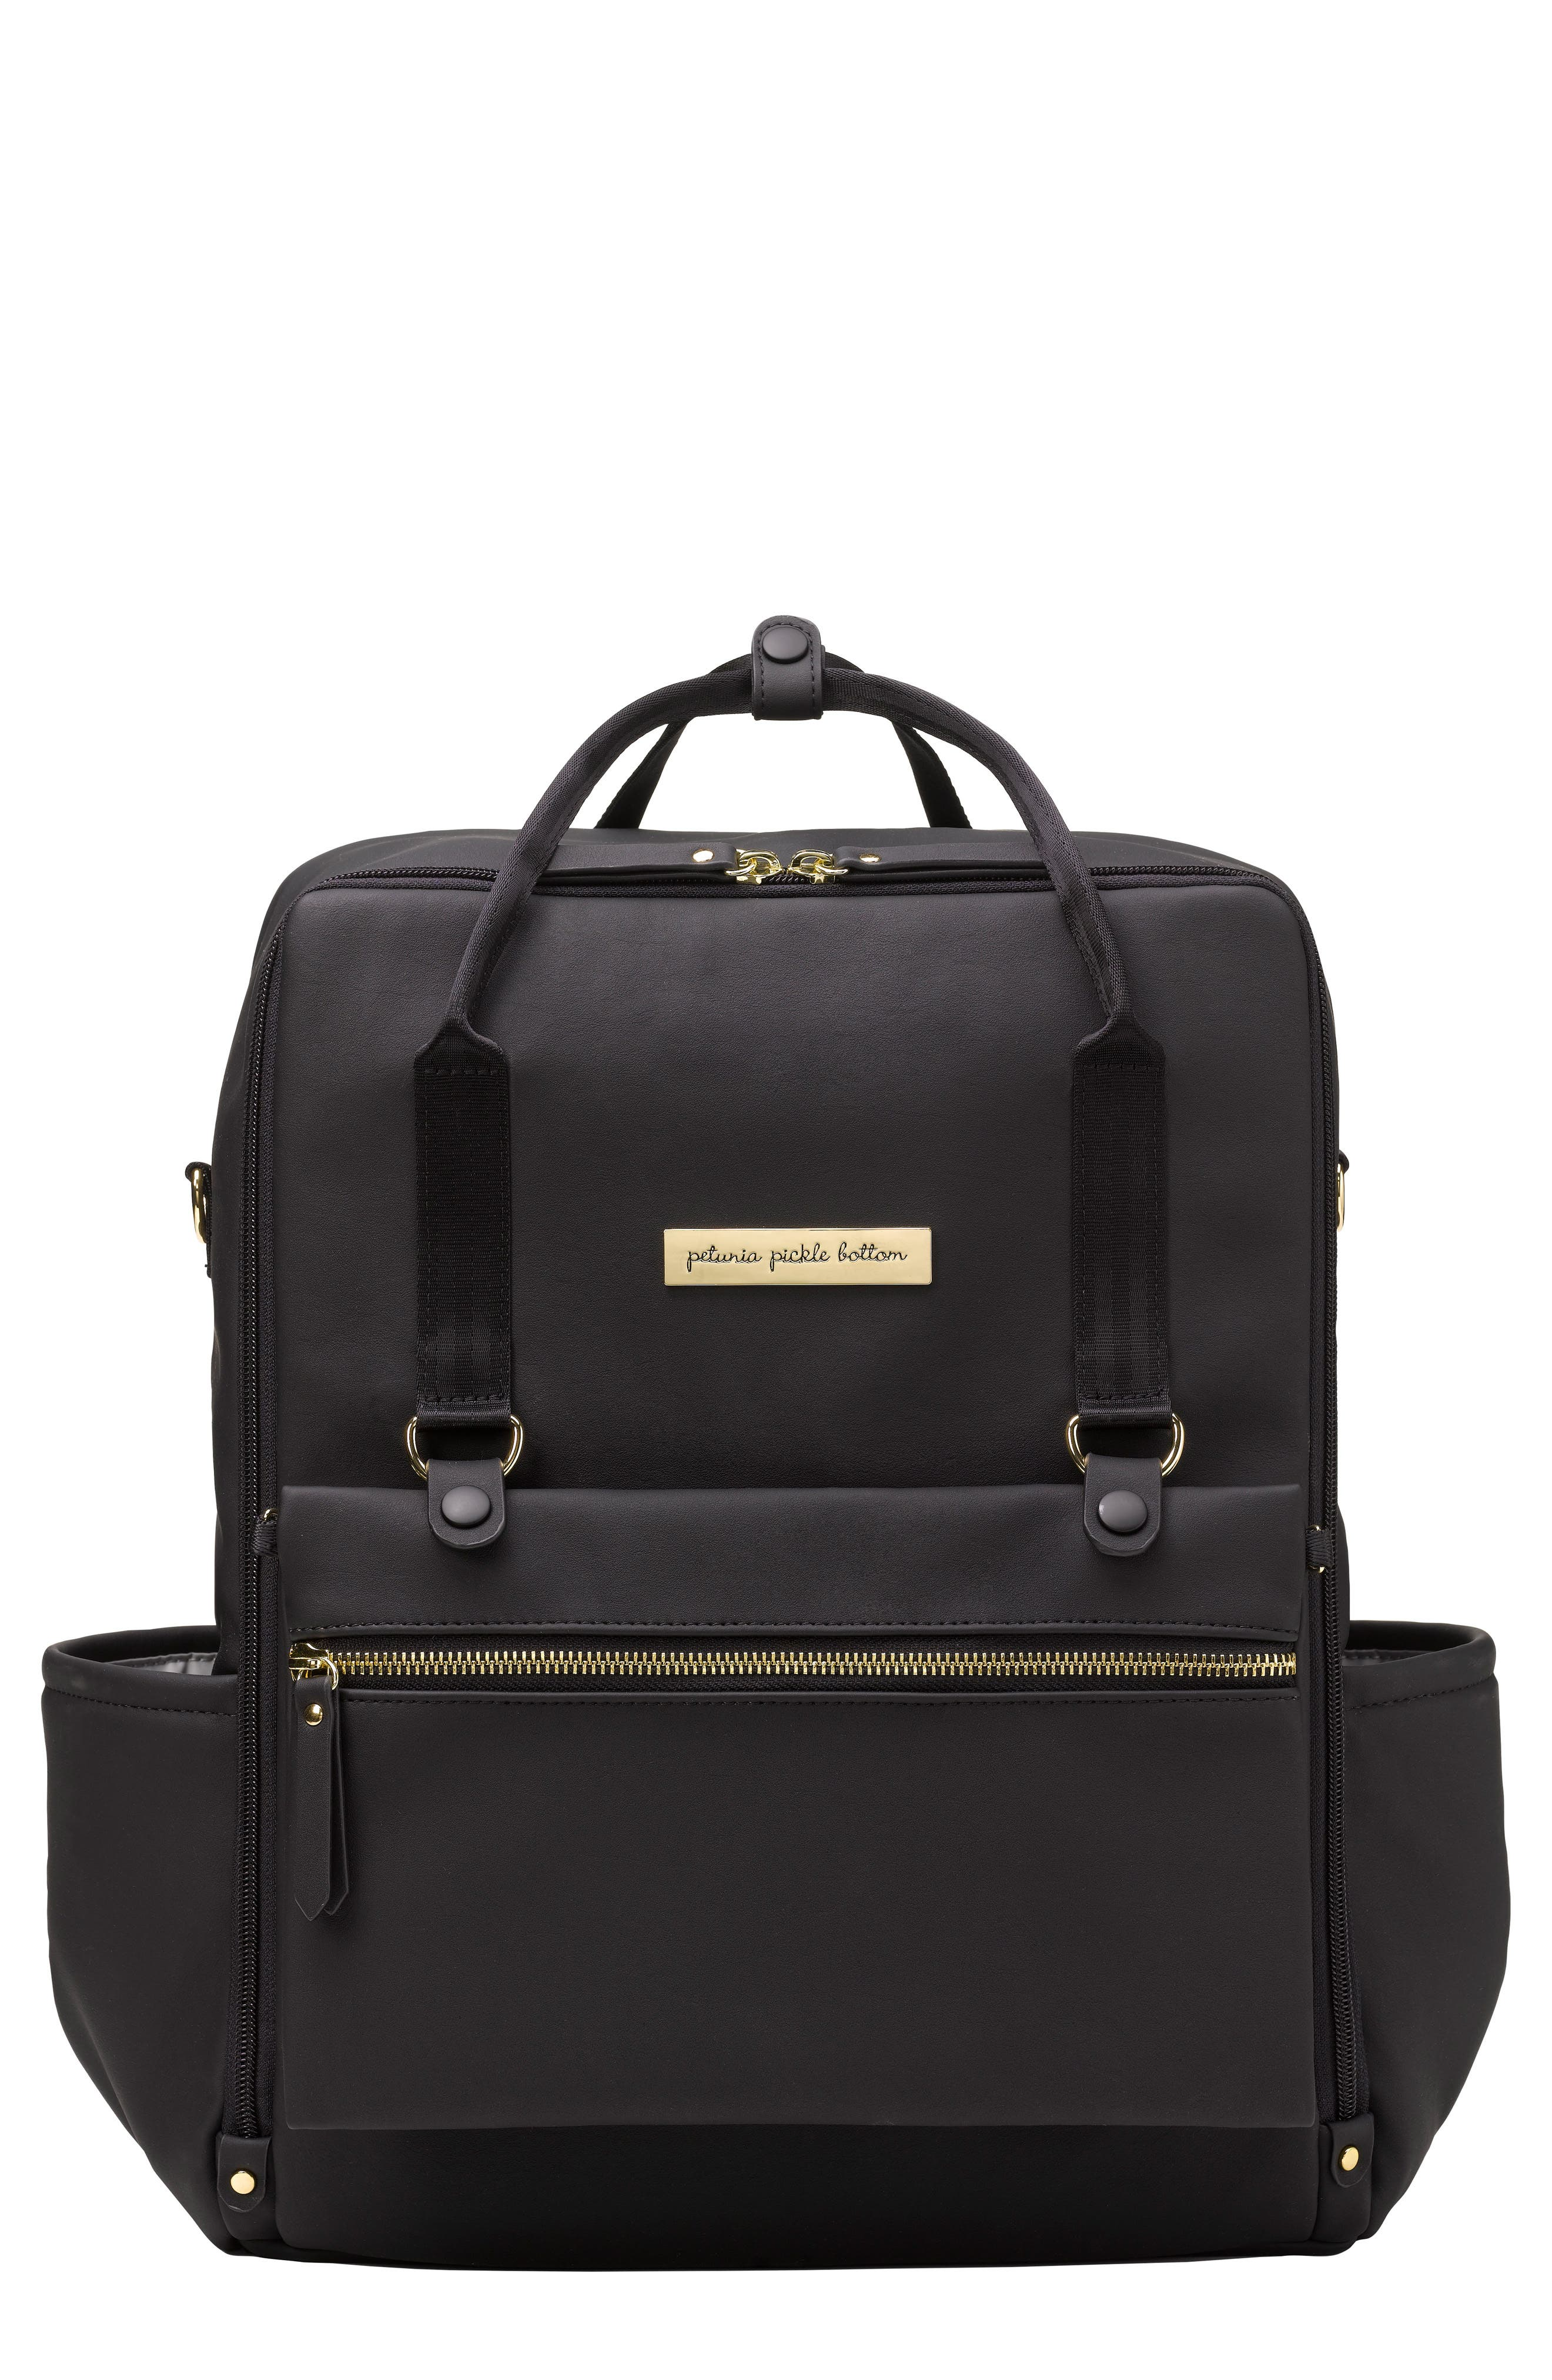 Balance Backpack Diaper Bag,                             Main thumbnail 1, color,                             Black Matte Leatherette